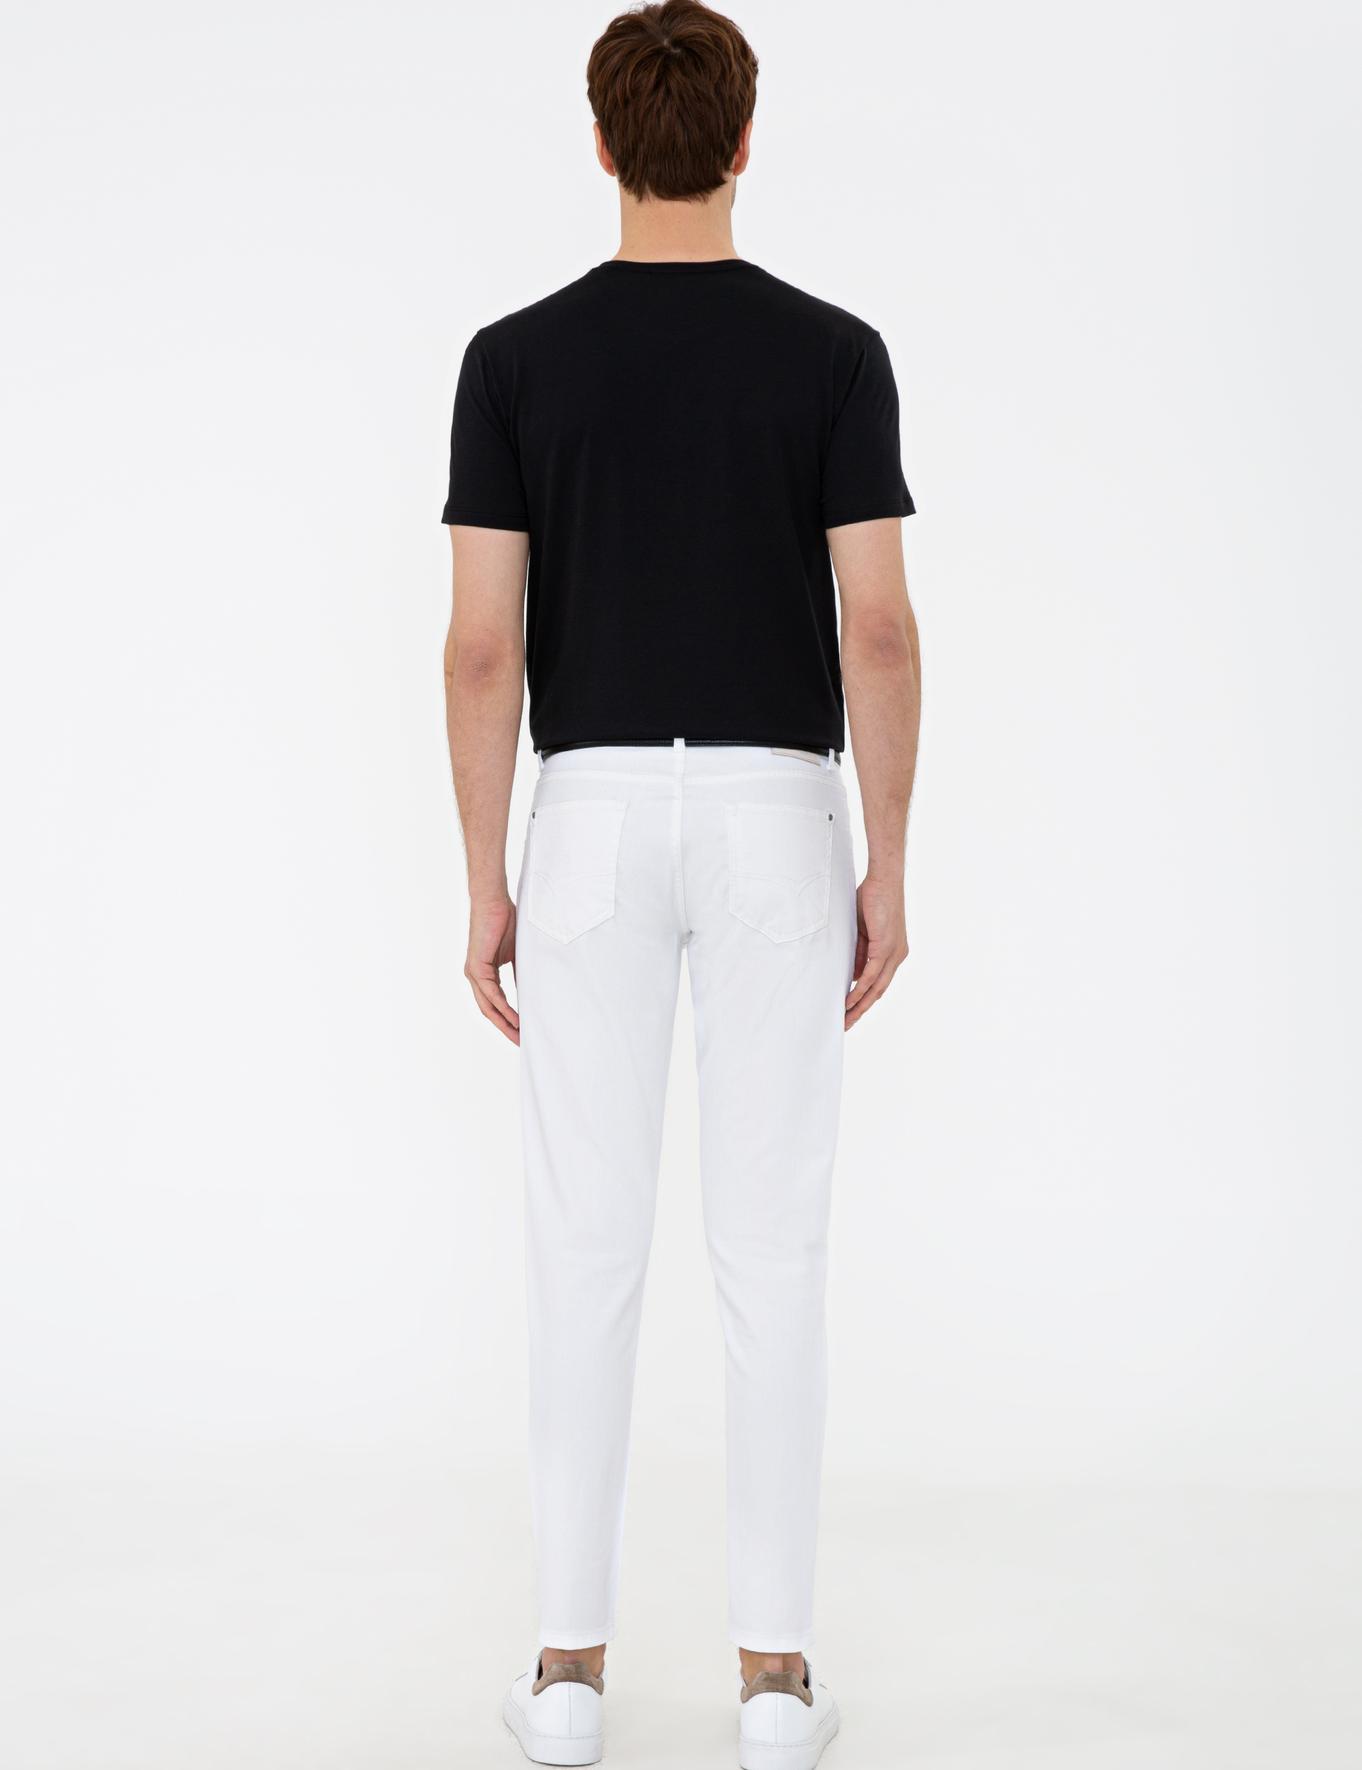 Beyaz Slim Fit Denim - 50232815057